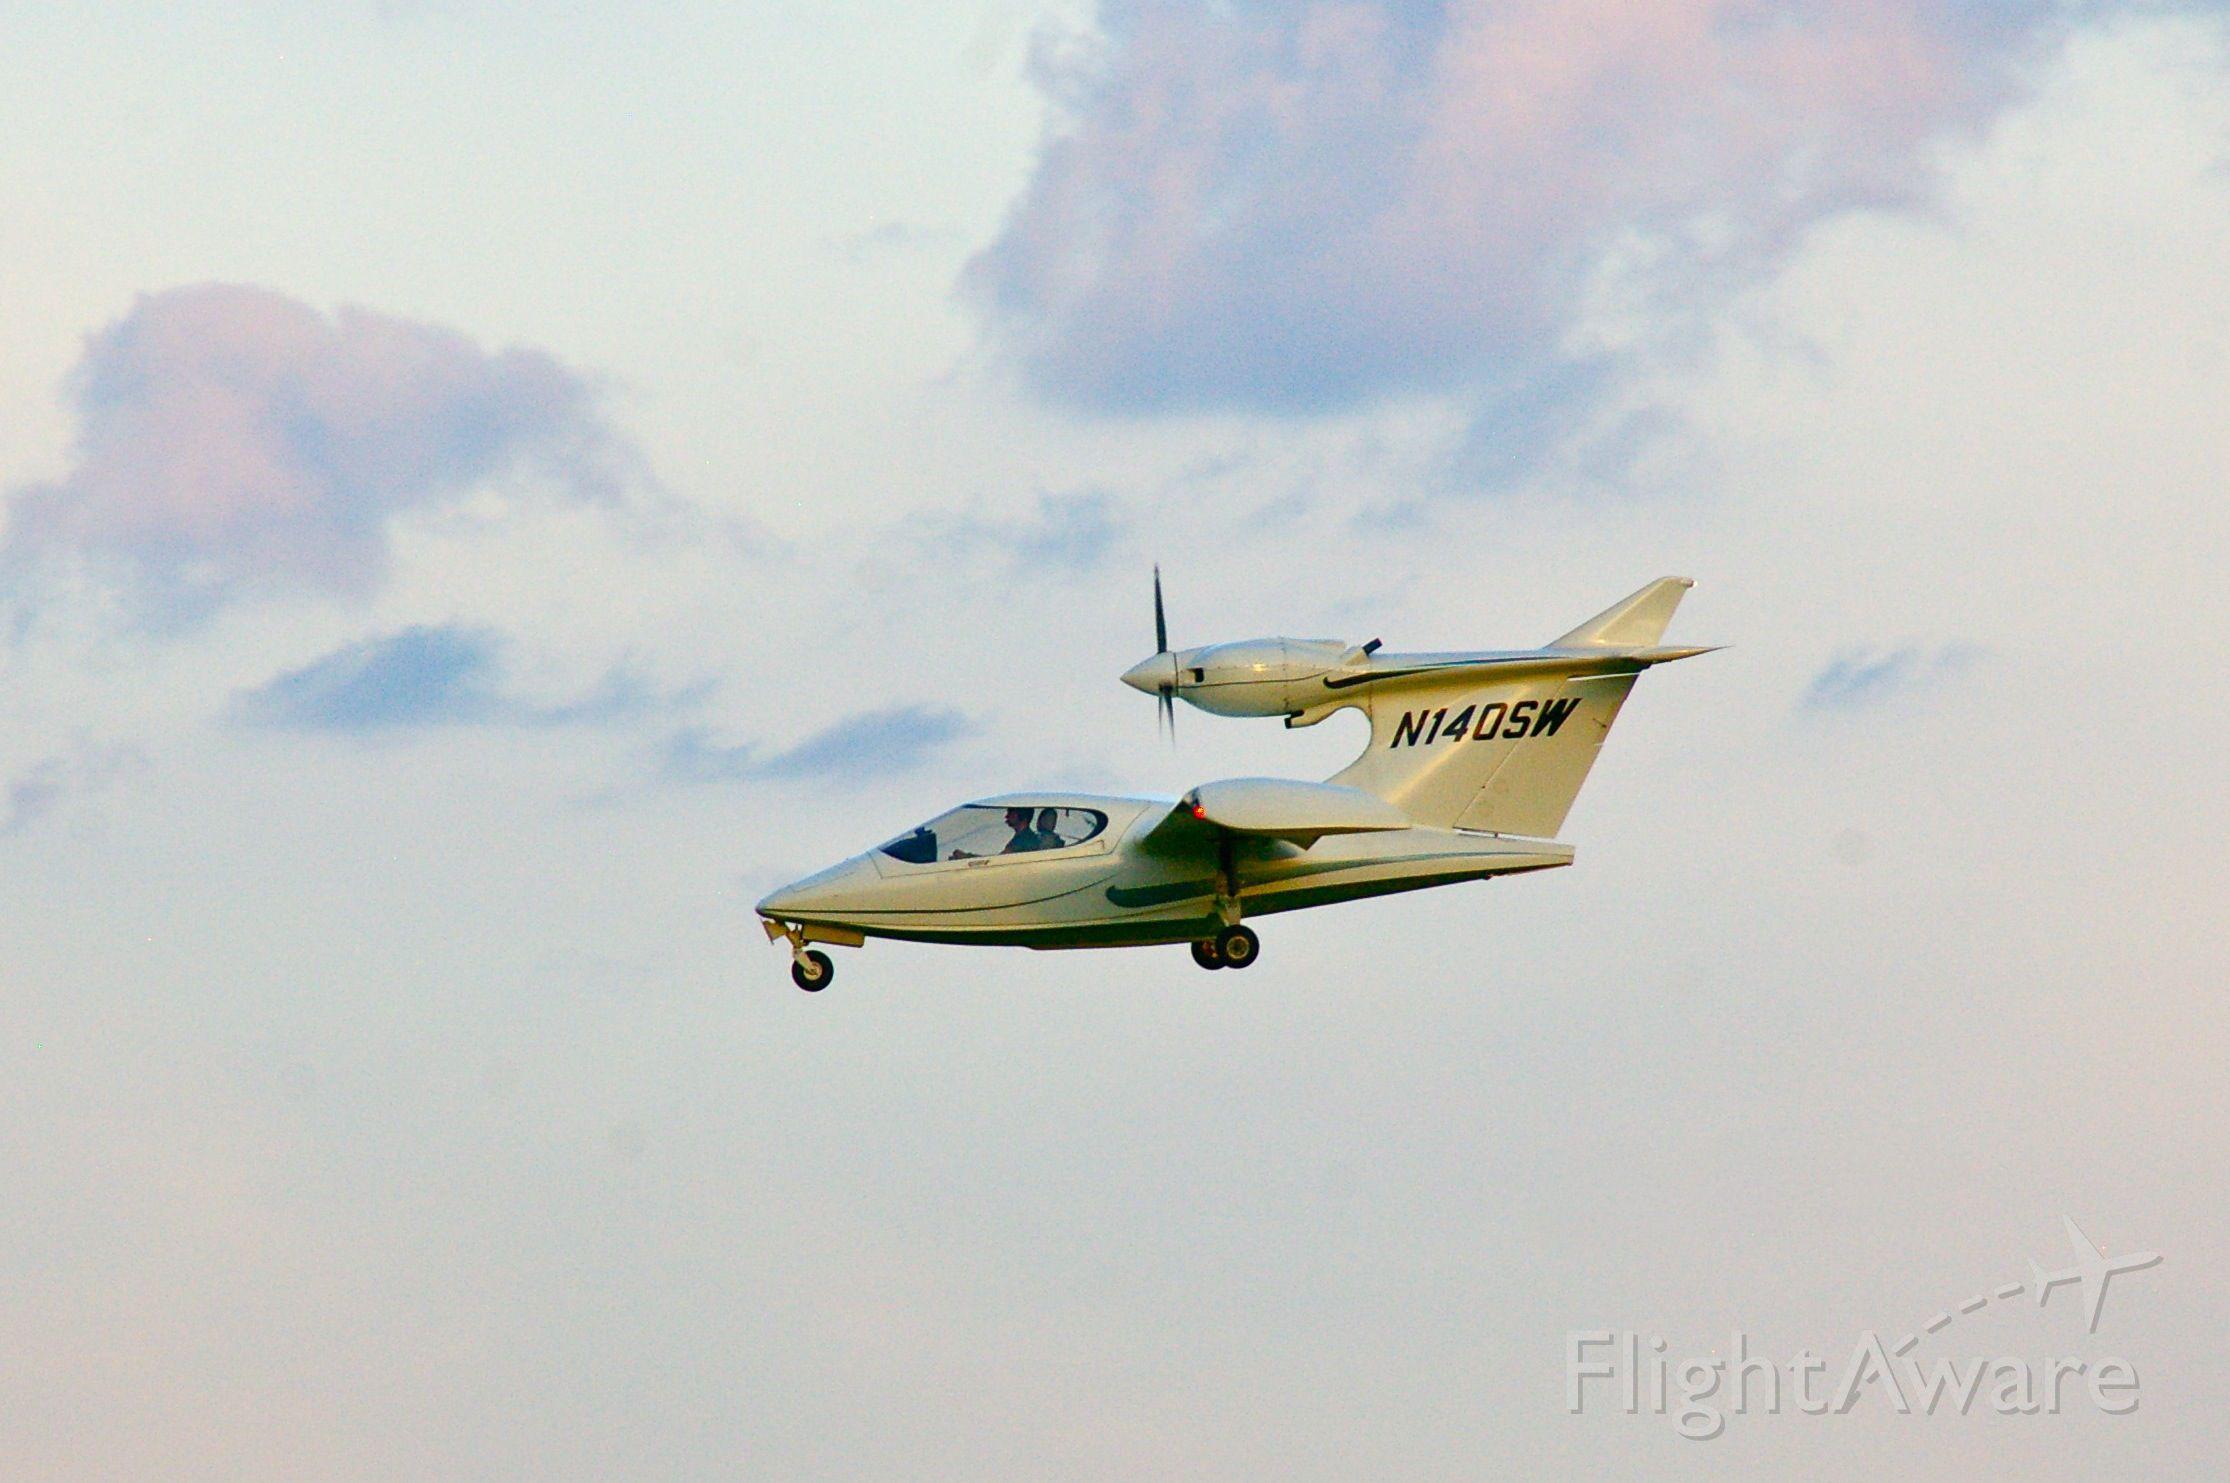 Experimental  (N140SW) - Seawind 3000